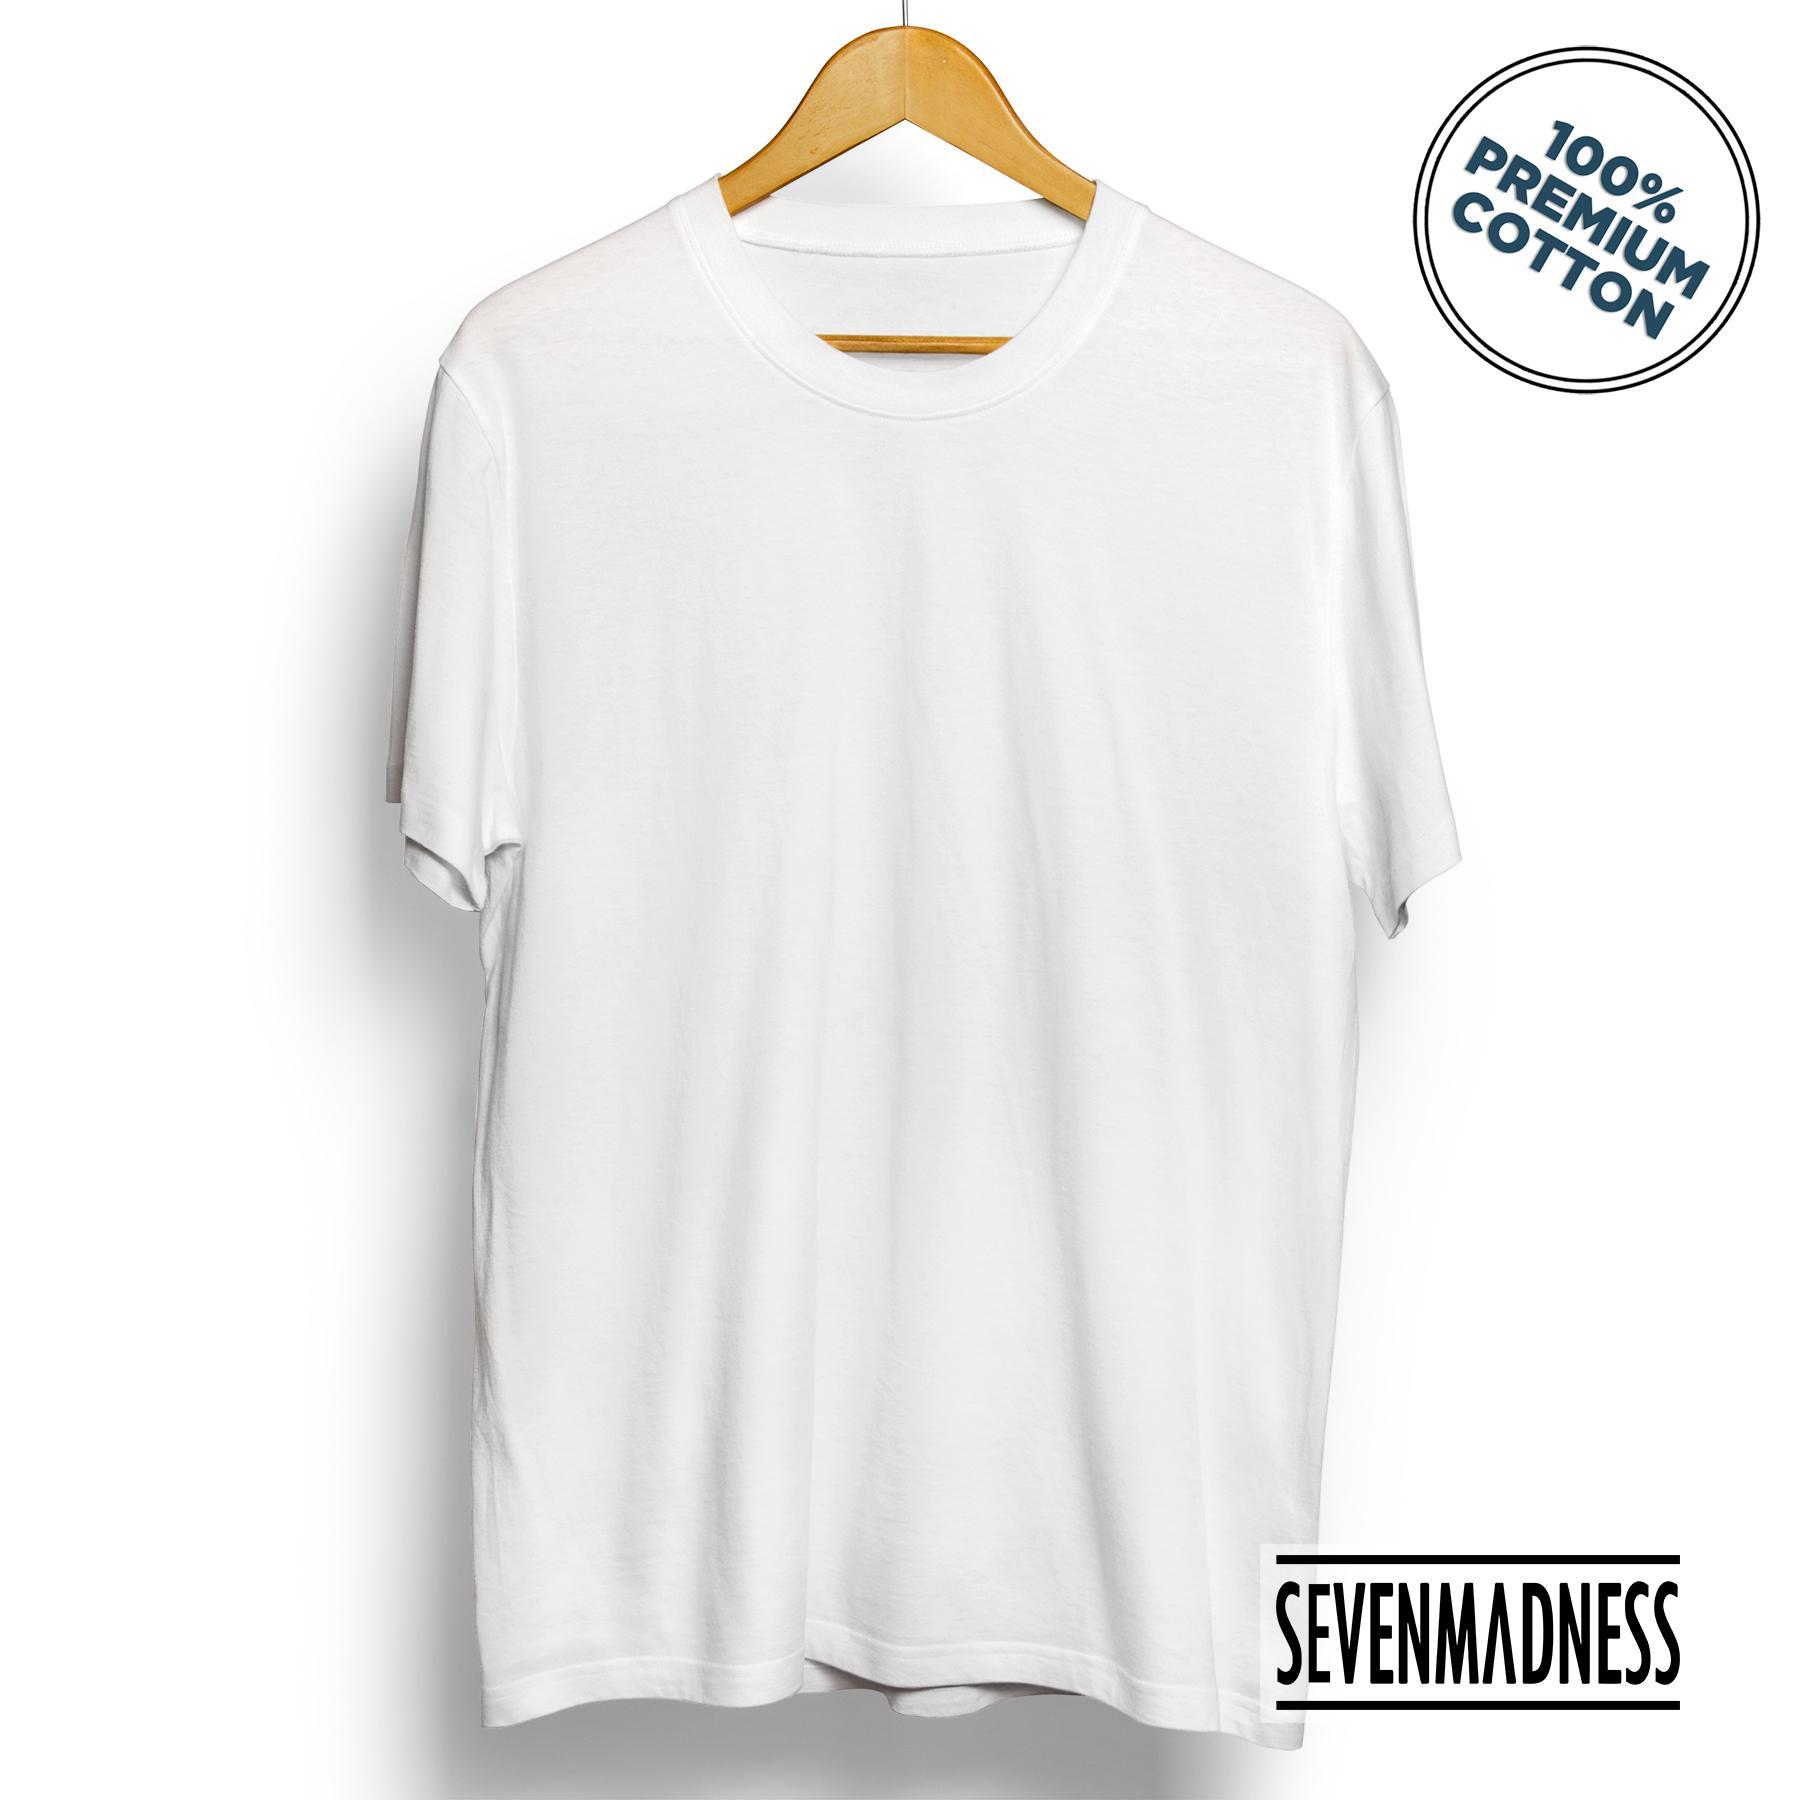 Sevenmadness - Kaos Polos Unisex Pria   Wanita - Premium Cotton Combed  Tshirt 2737bcfd7e